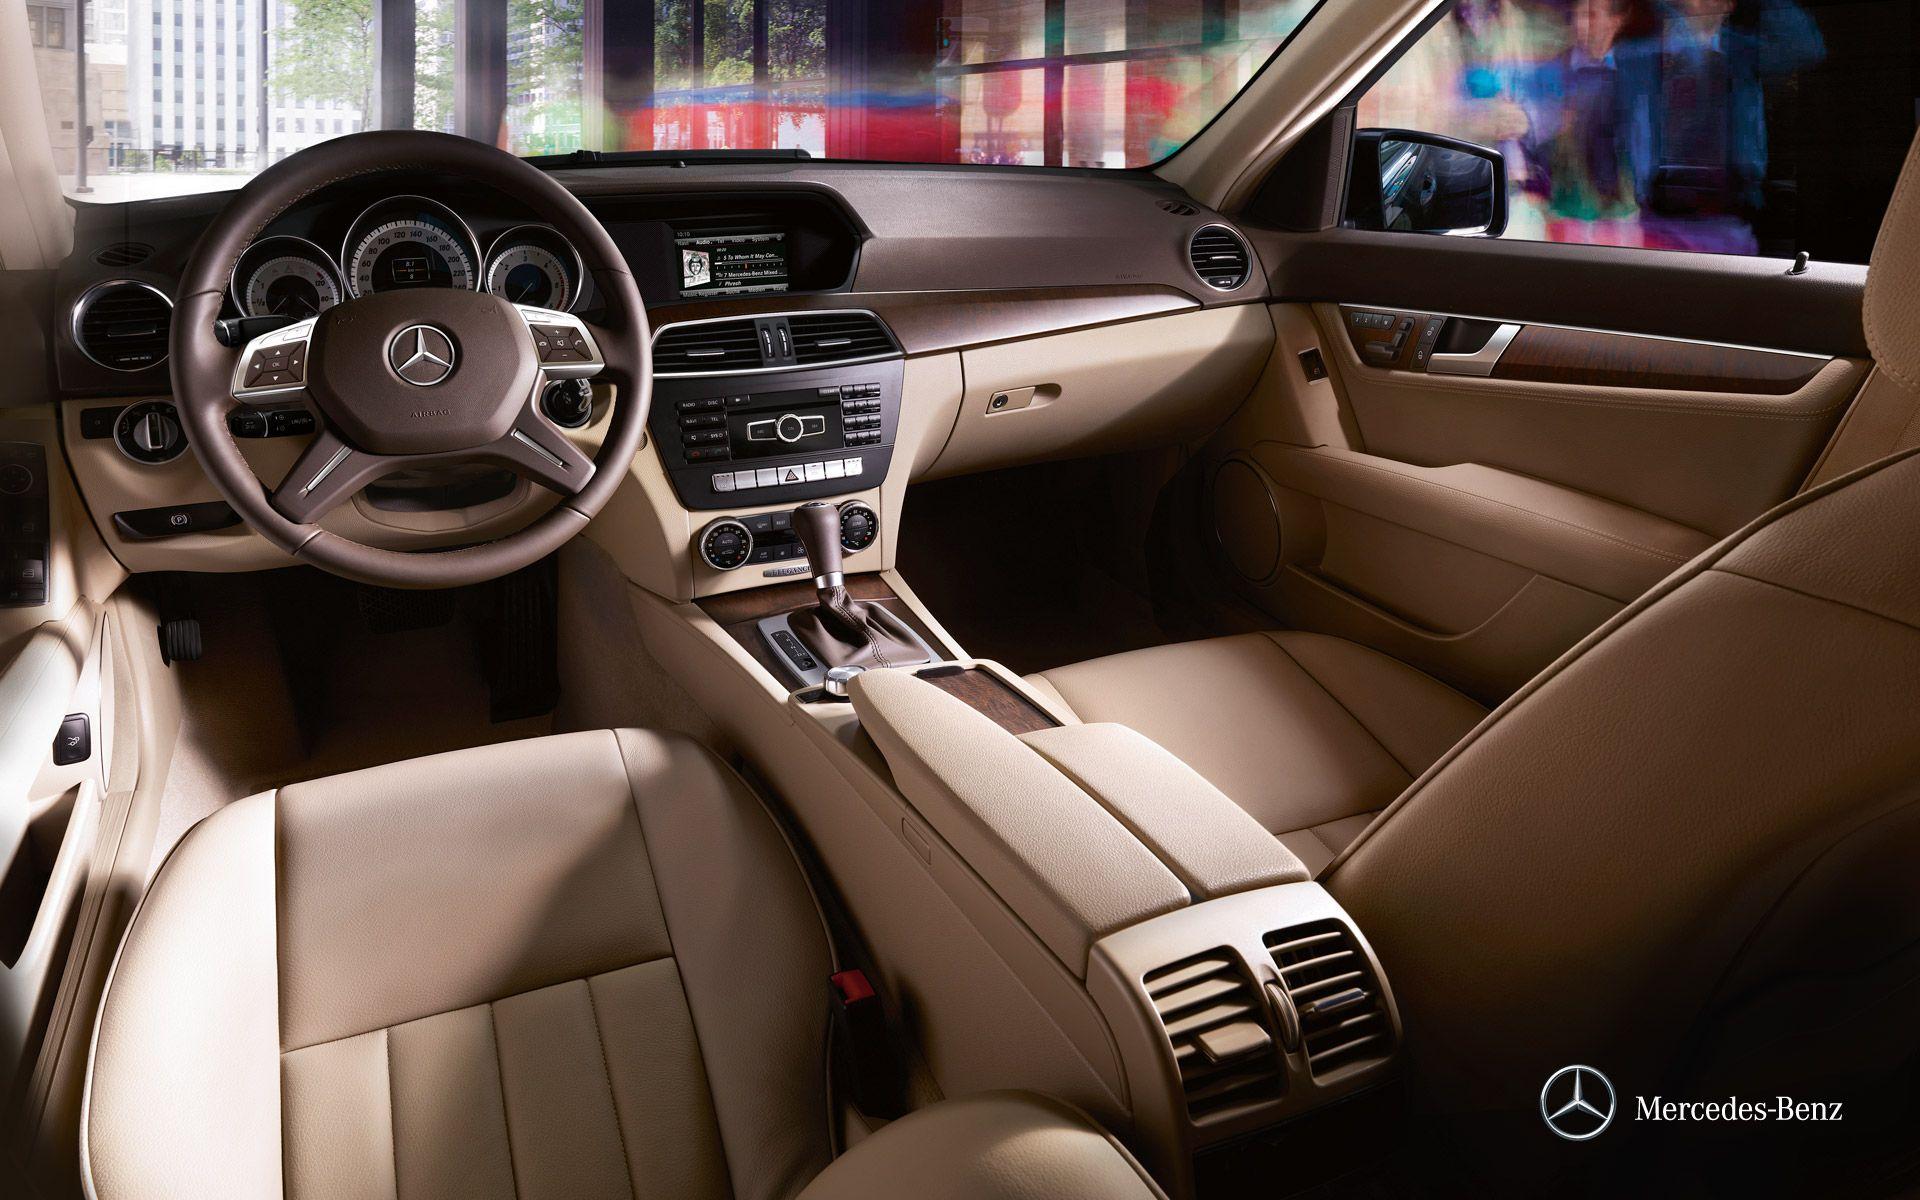 Mercedes-Benz C-Class Sedan. Fuel consumption combined: 12,0-4,1 l/100km, CO2 emissions combined: 280-109 g/km.  #MBCars